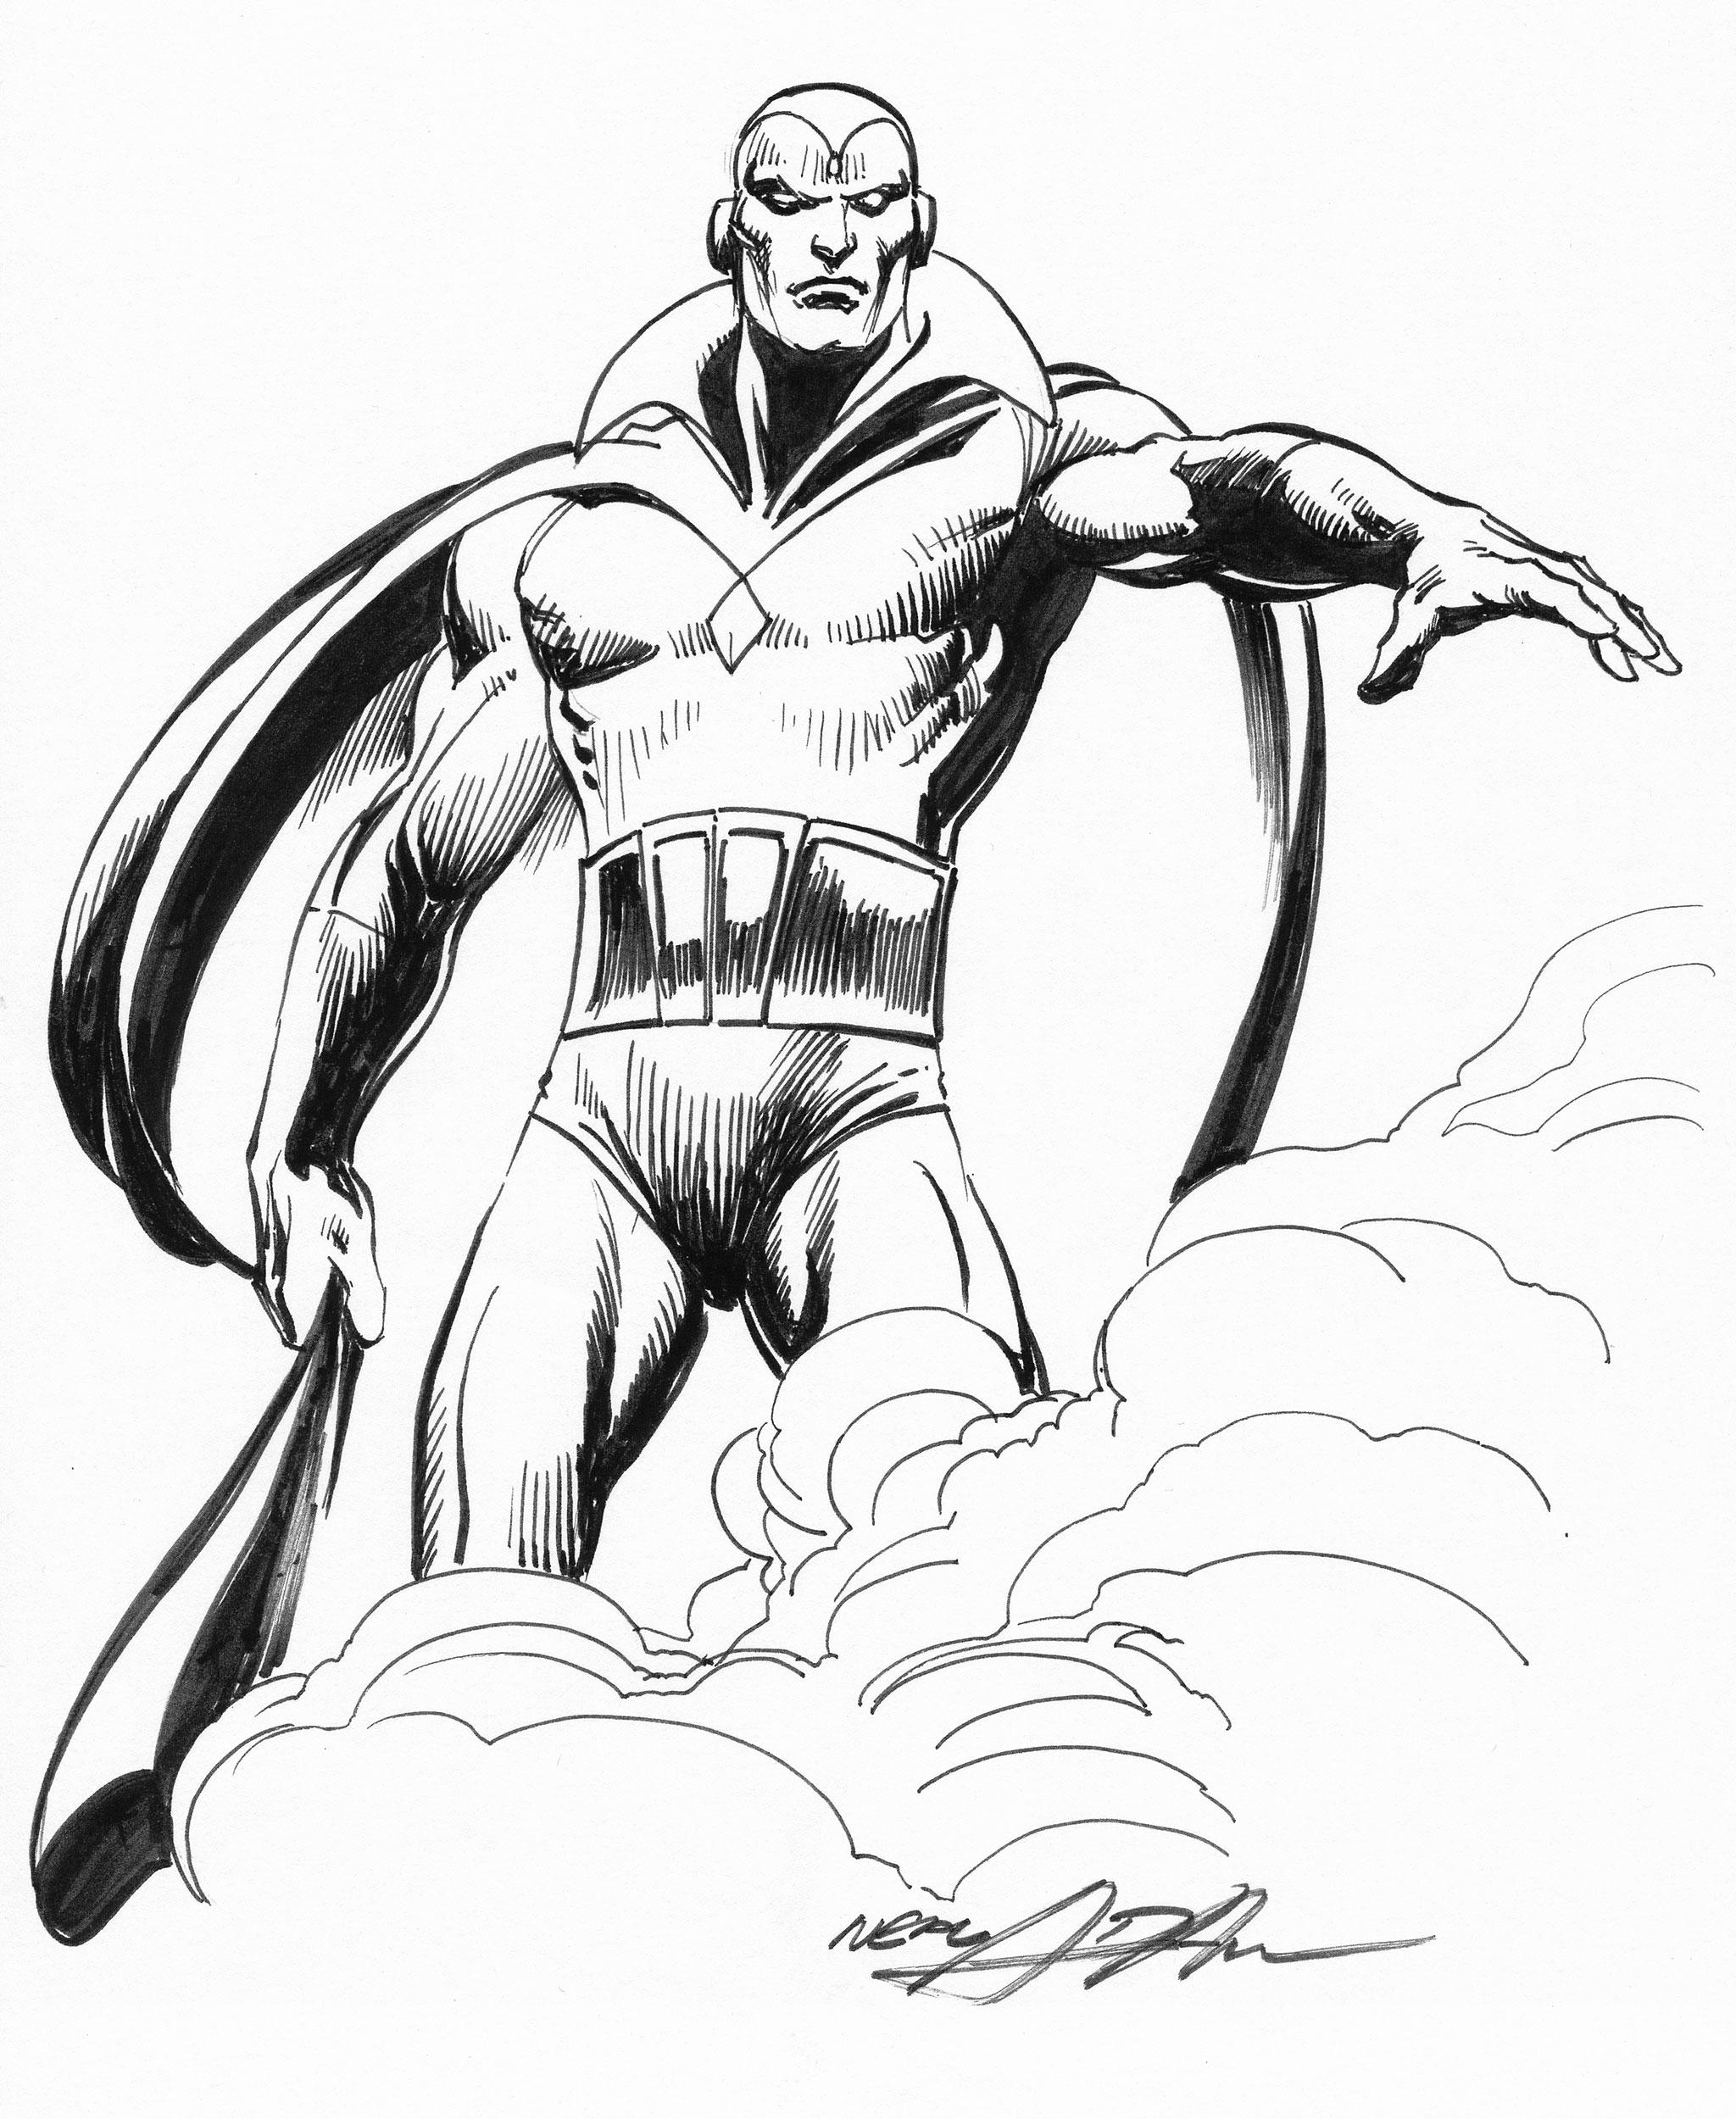 2048x2500 Neal Adams Original Inked Vision Drawing Comic Artwork For Sale